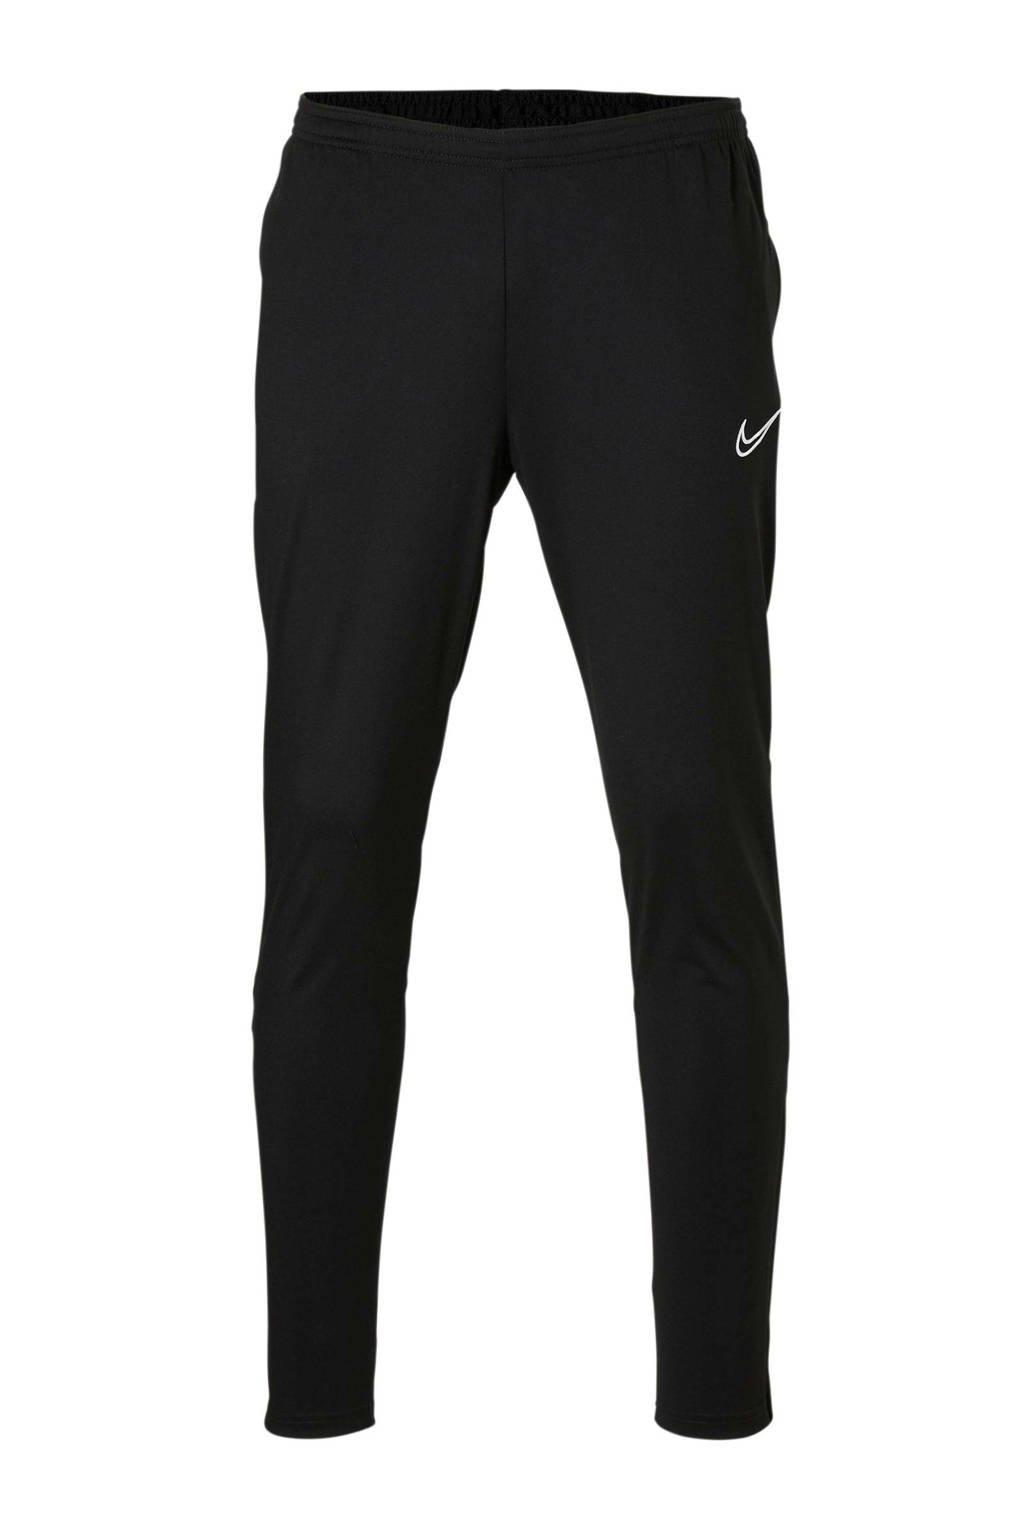 Nike   sportbroek zwart/wit, Zwart/wit